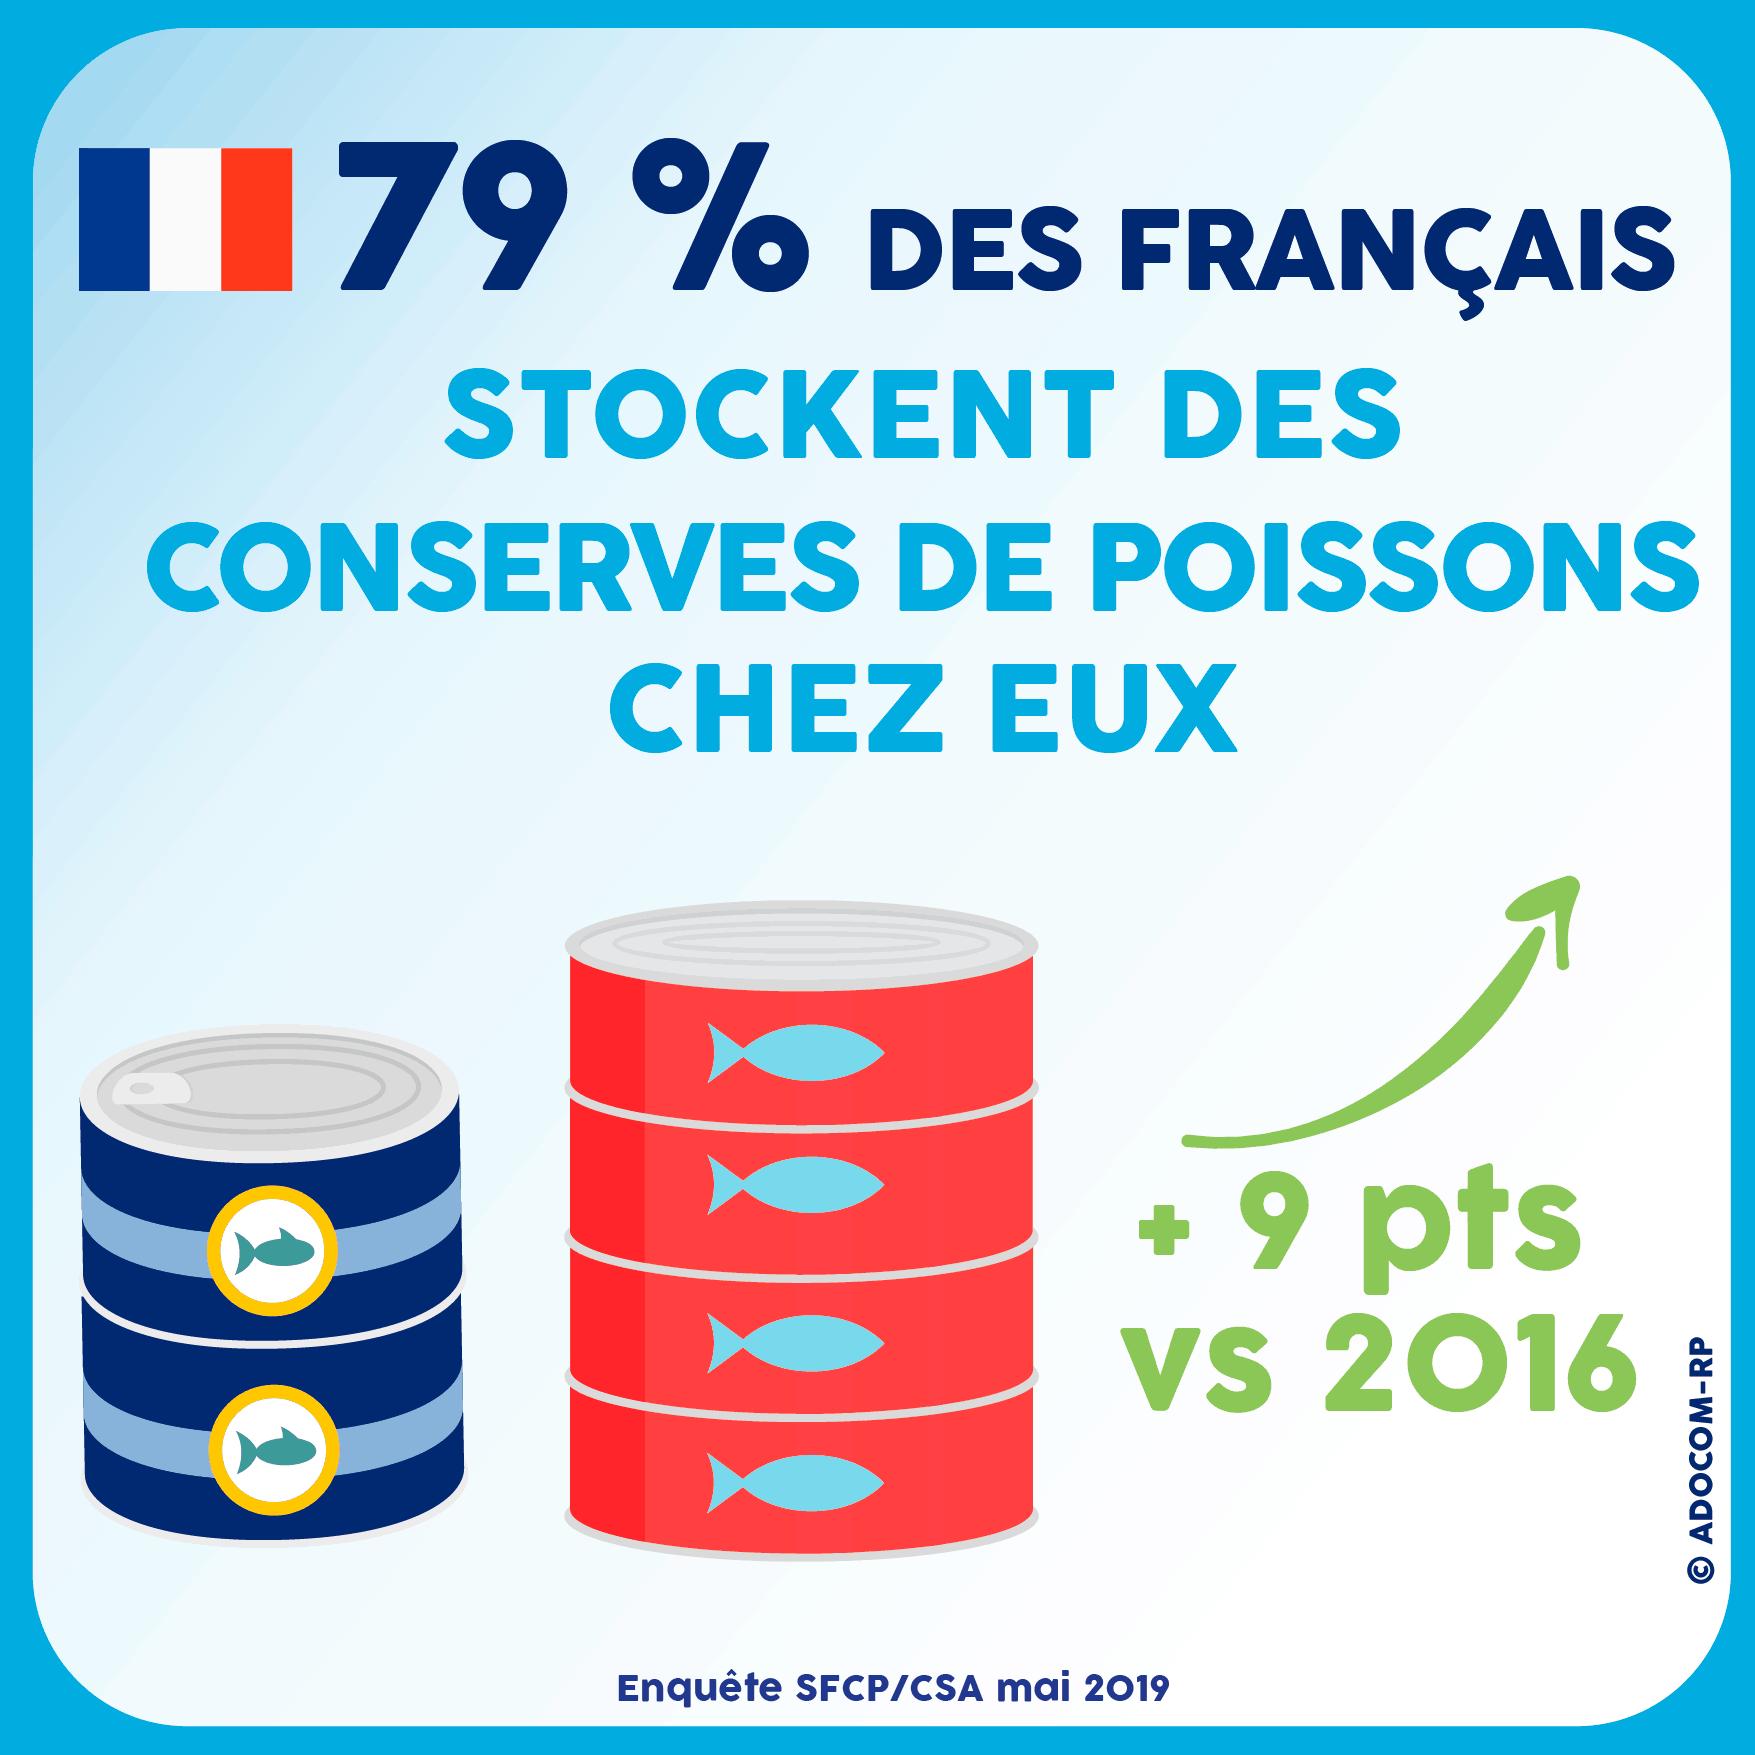 79% des Français stockent des Conserves de Poissons chez eux - Enquête SFCP/CSA mai 2019 - Adocom-RP